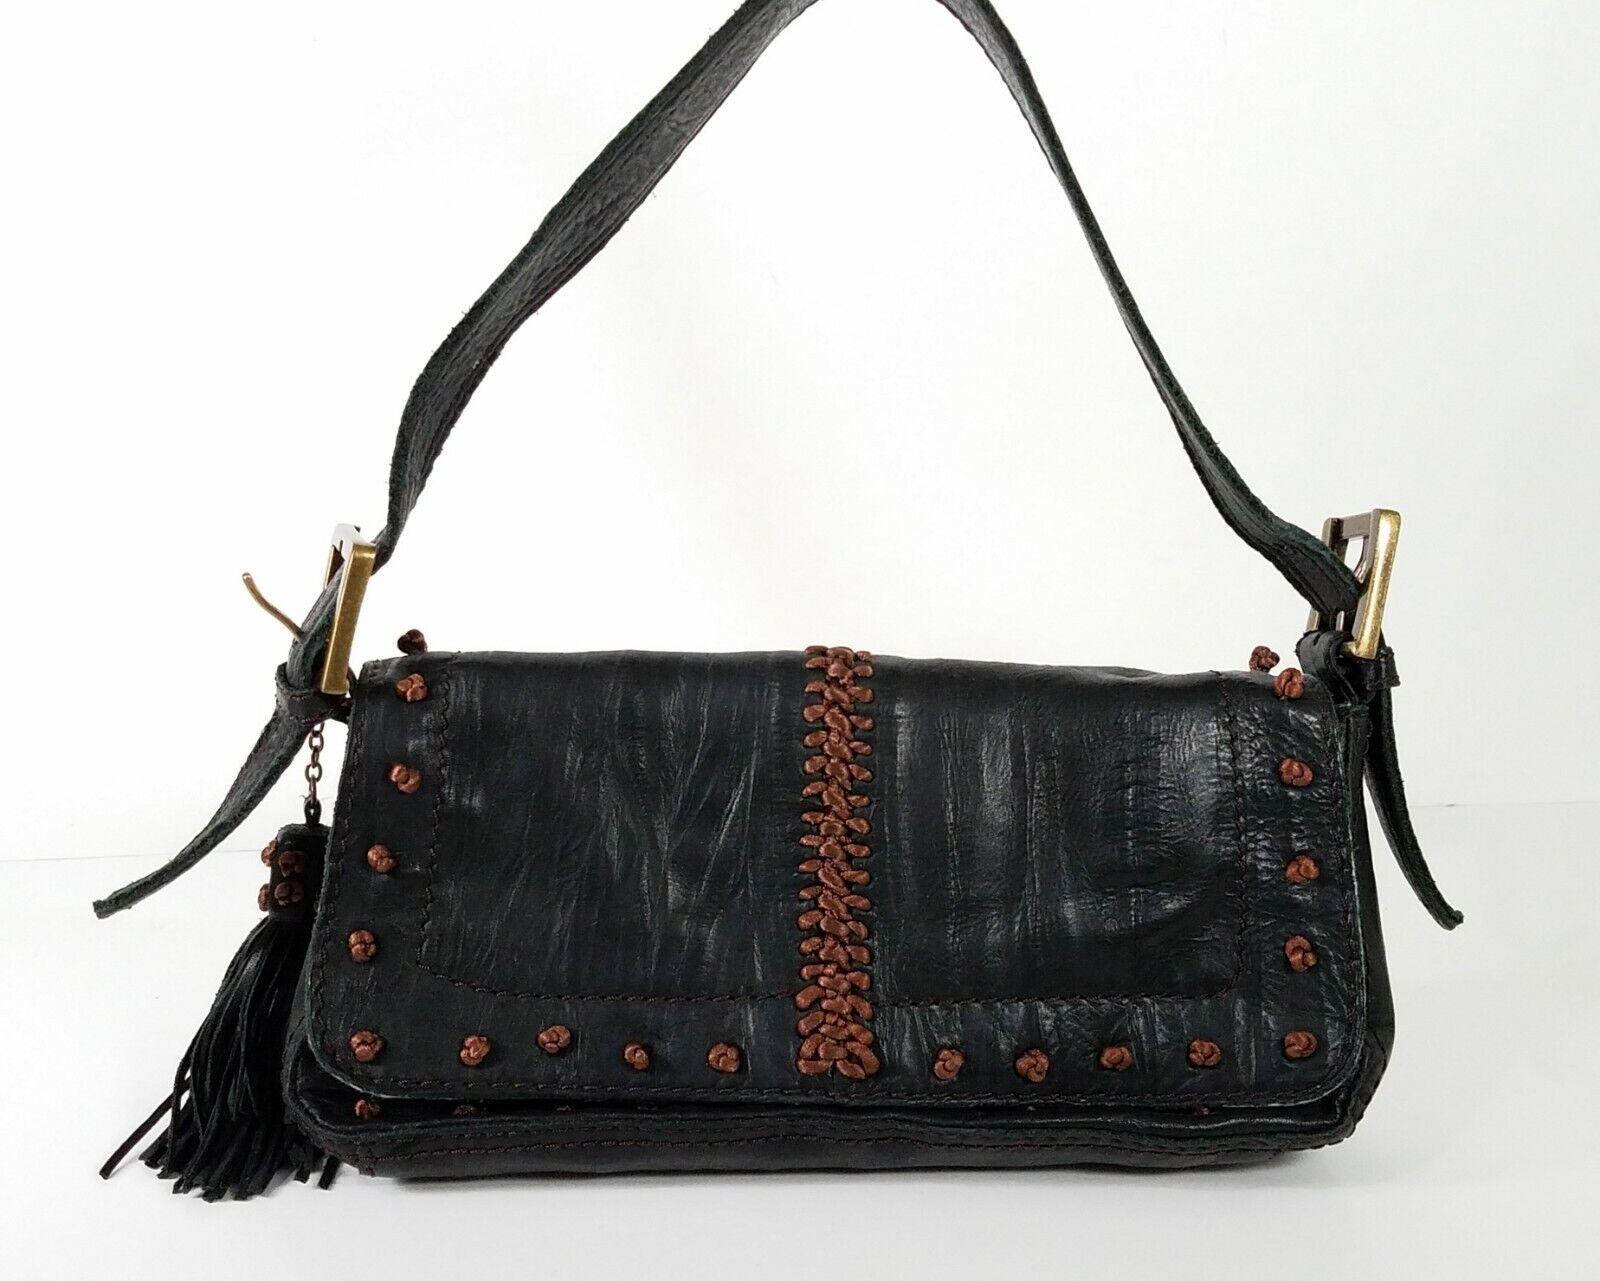 Steve Madden Leather Knotted Baguette Handbag (Small) H 5.25